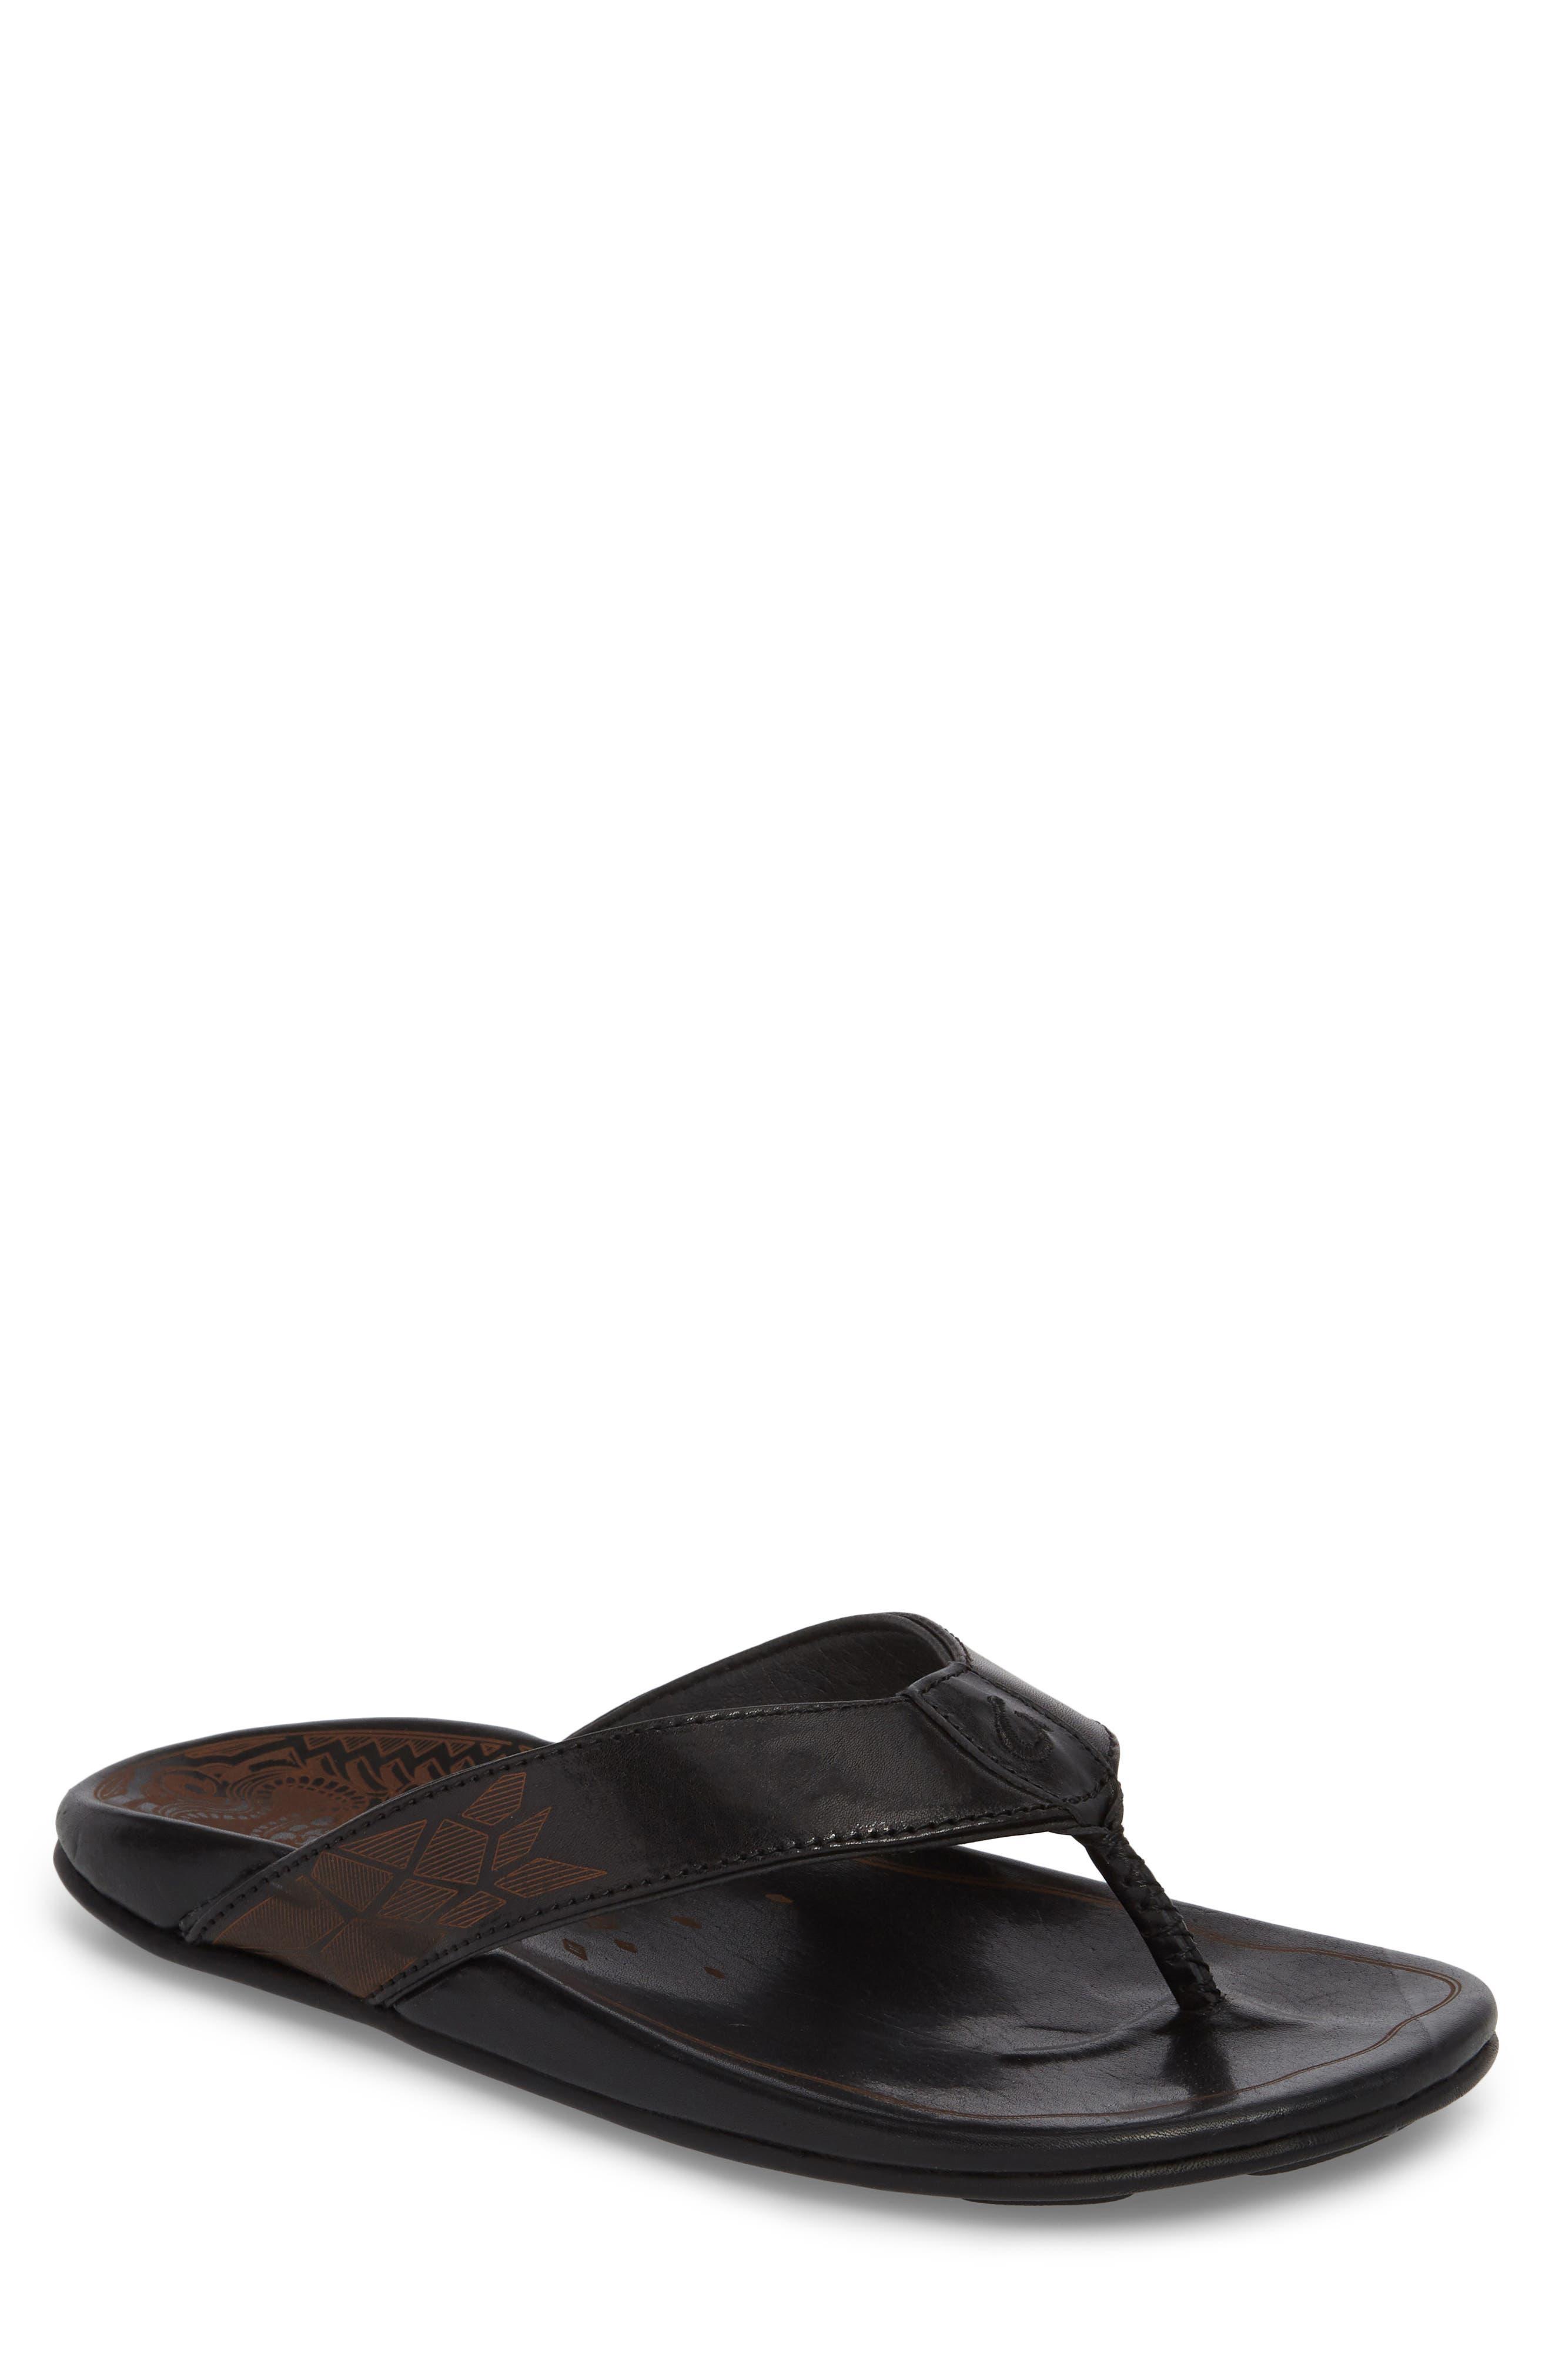 Kulia Flip Flop,                         Main,                         color, Black/ Black Leather